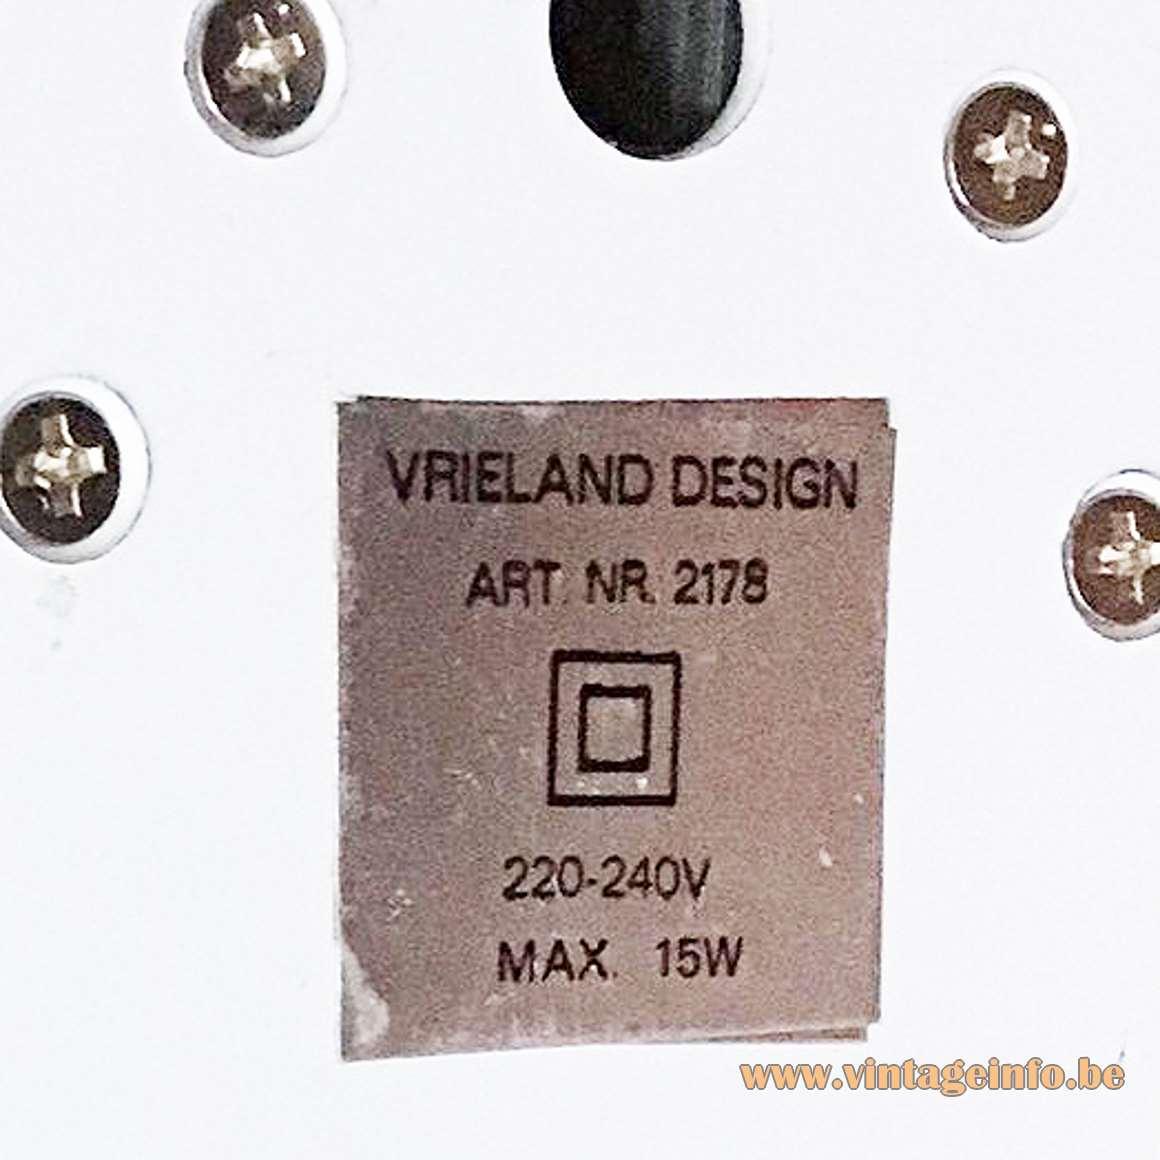 Vrieland Design Face Table Lamp foldable 1970s 1980s MCM